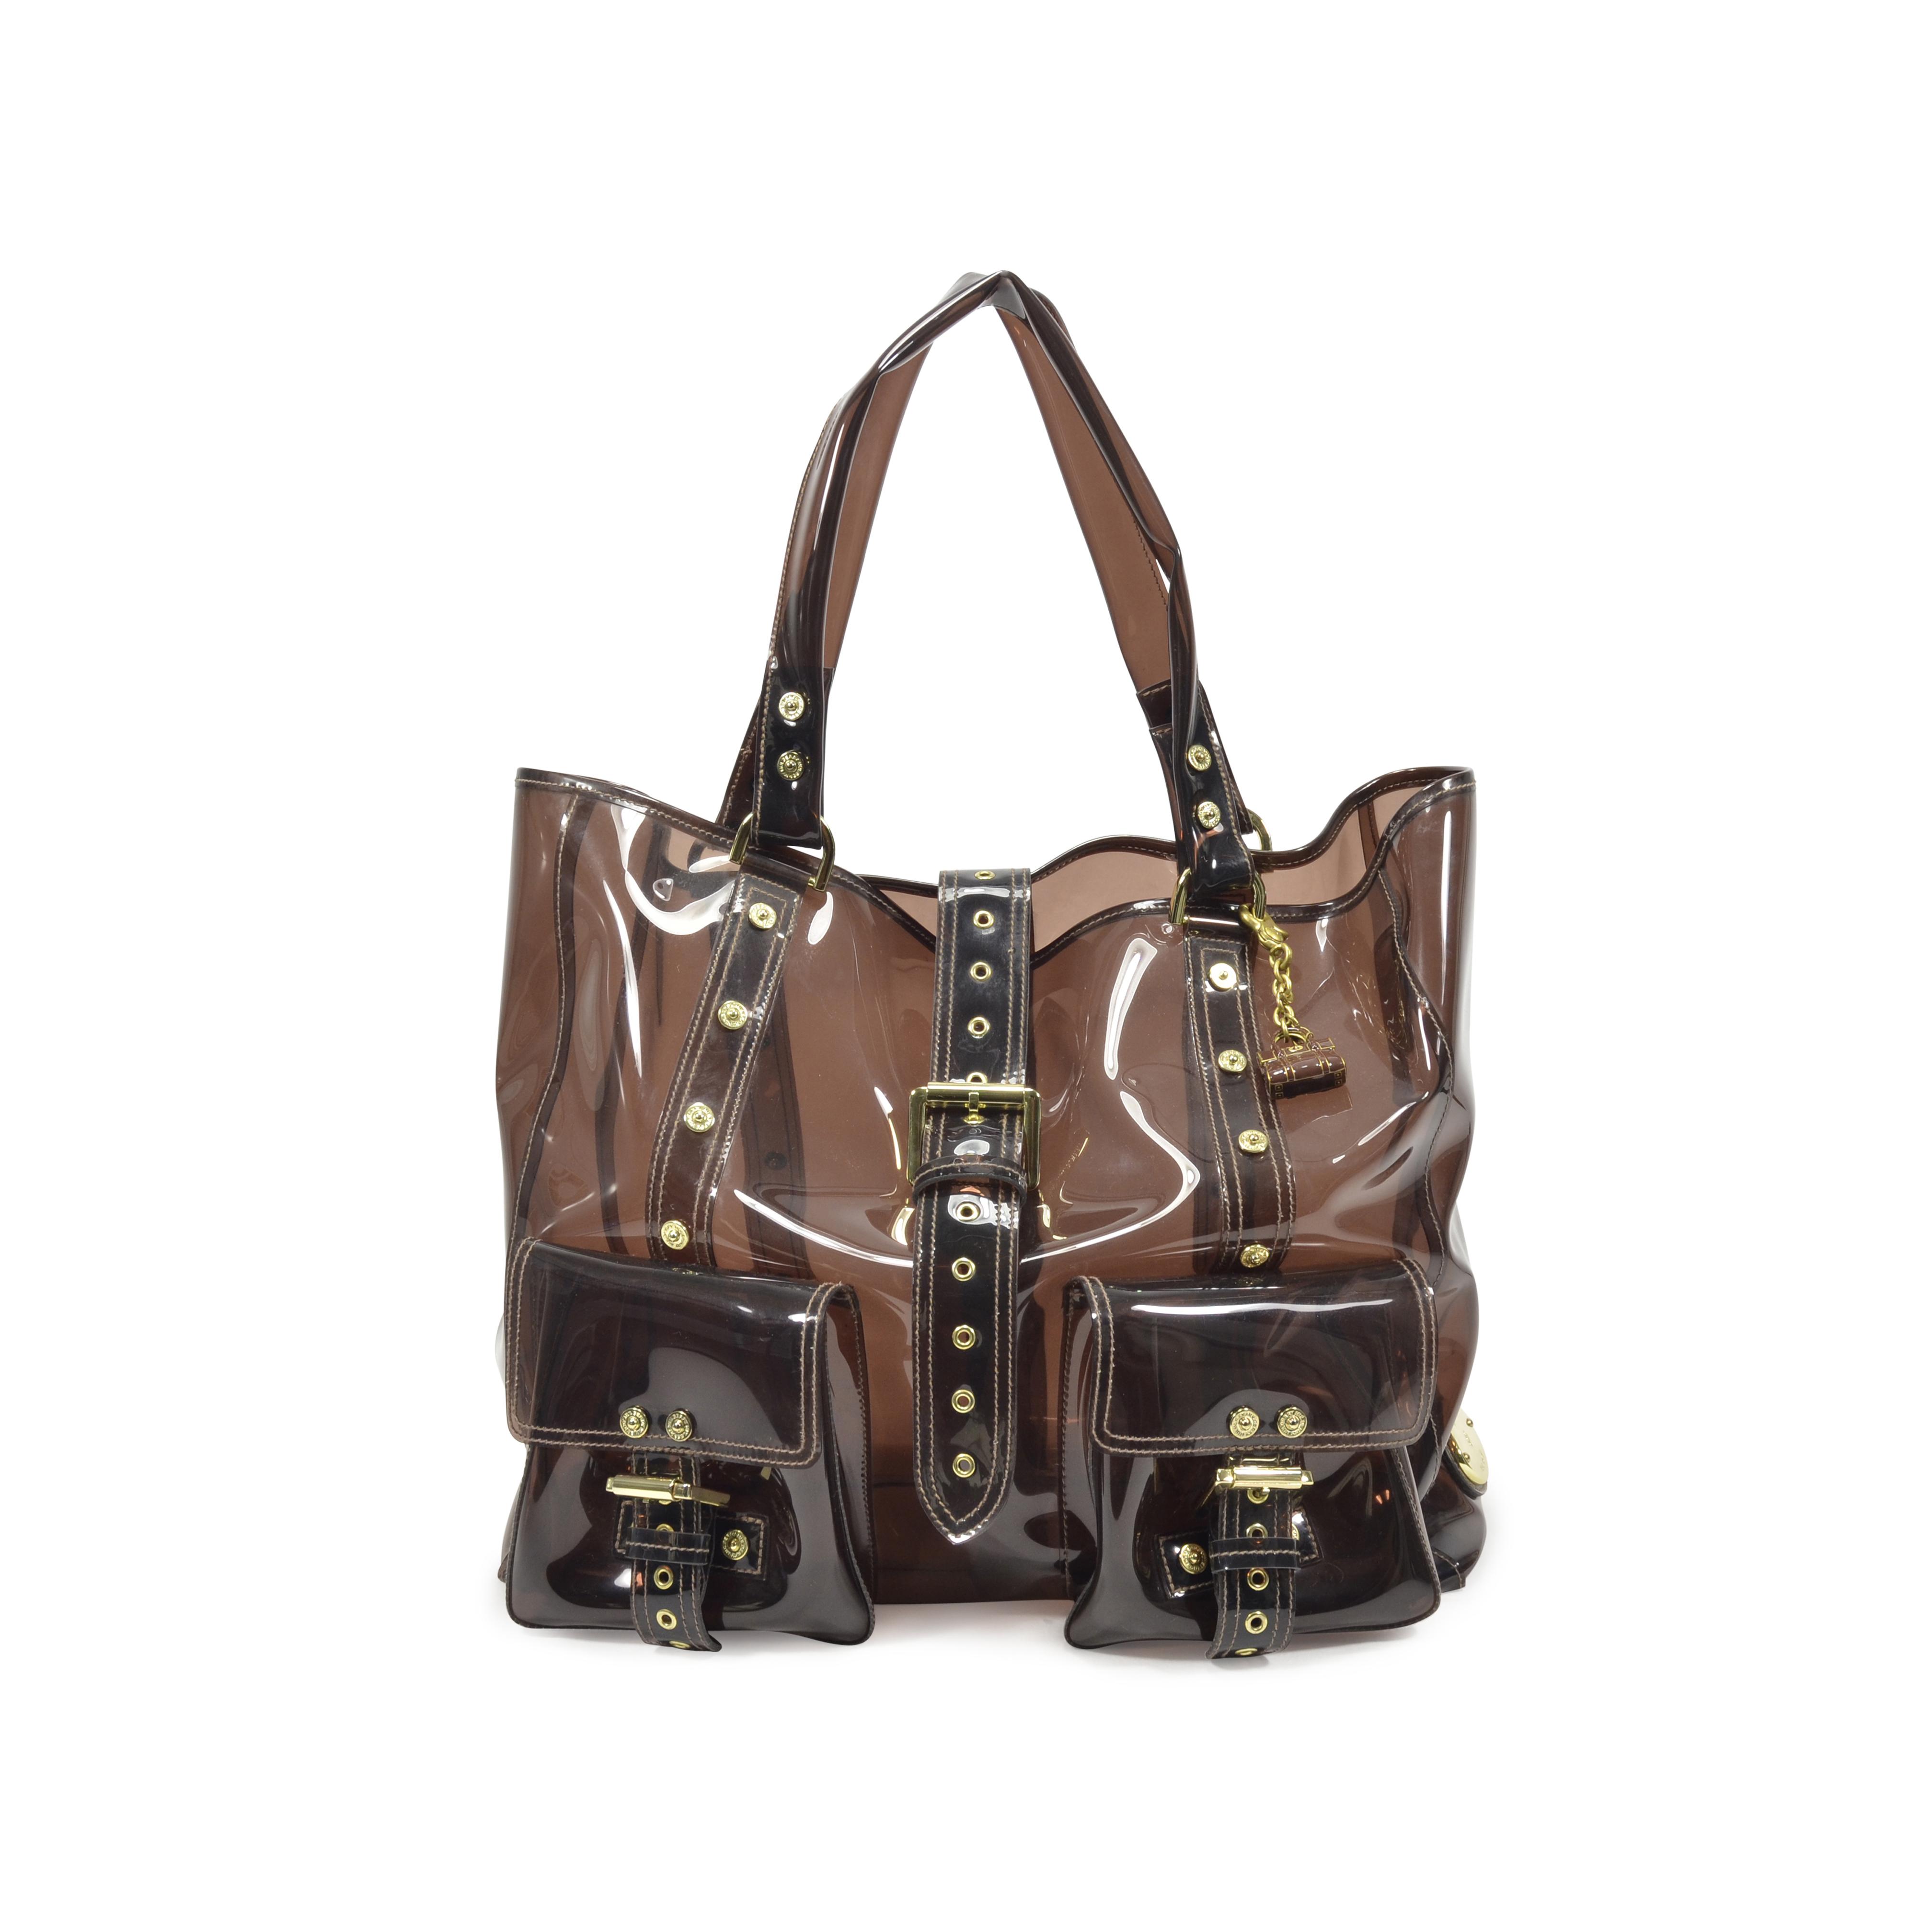 e814138757b cheap mulberry roxanne bag shoulder strap heels e1a1b 27438